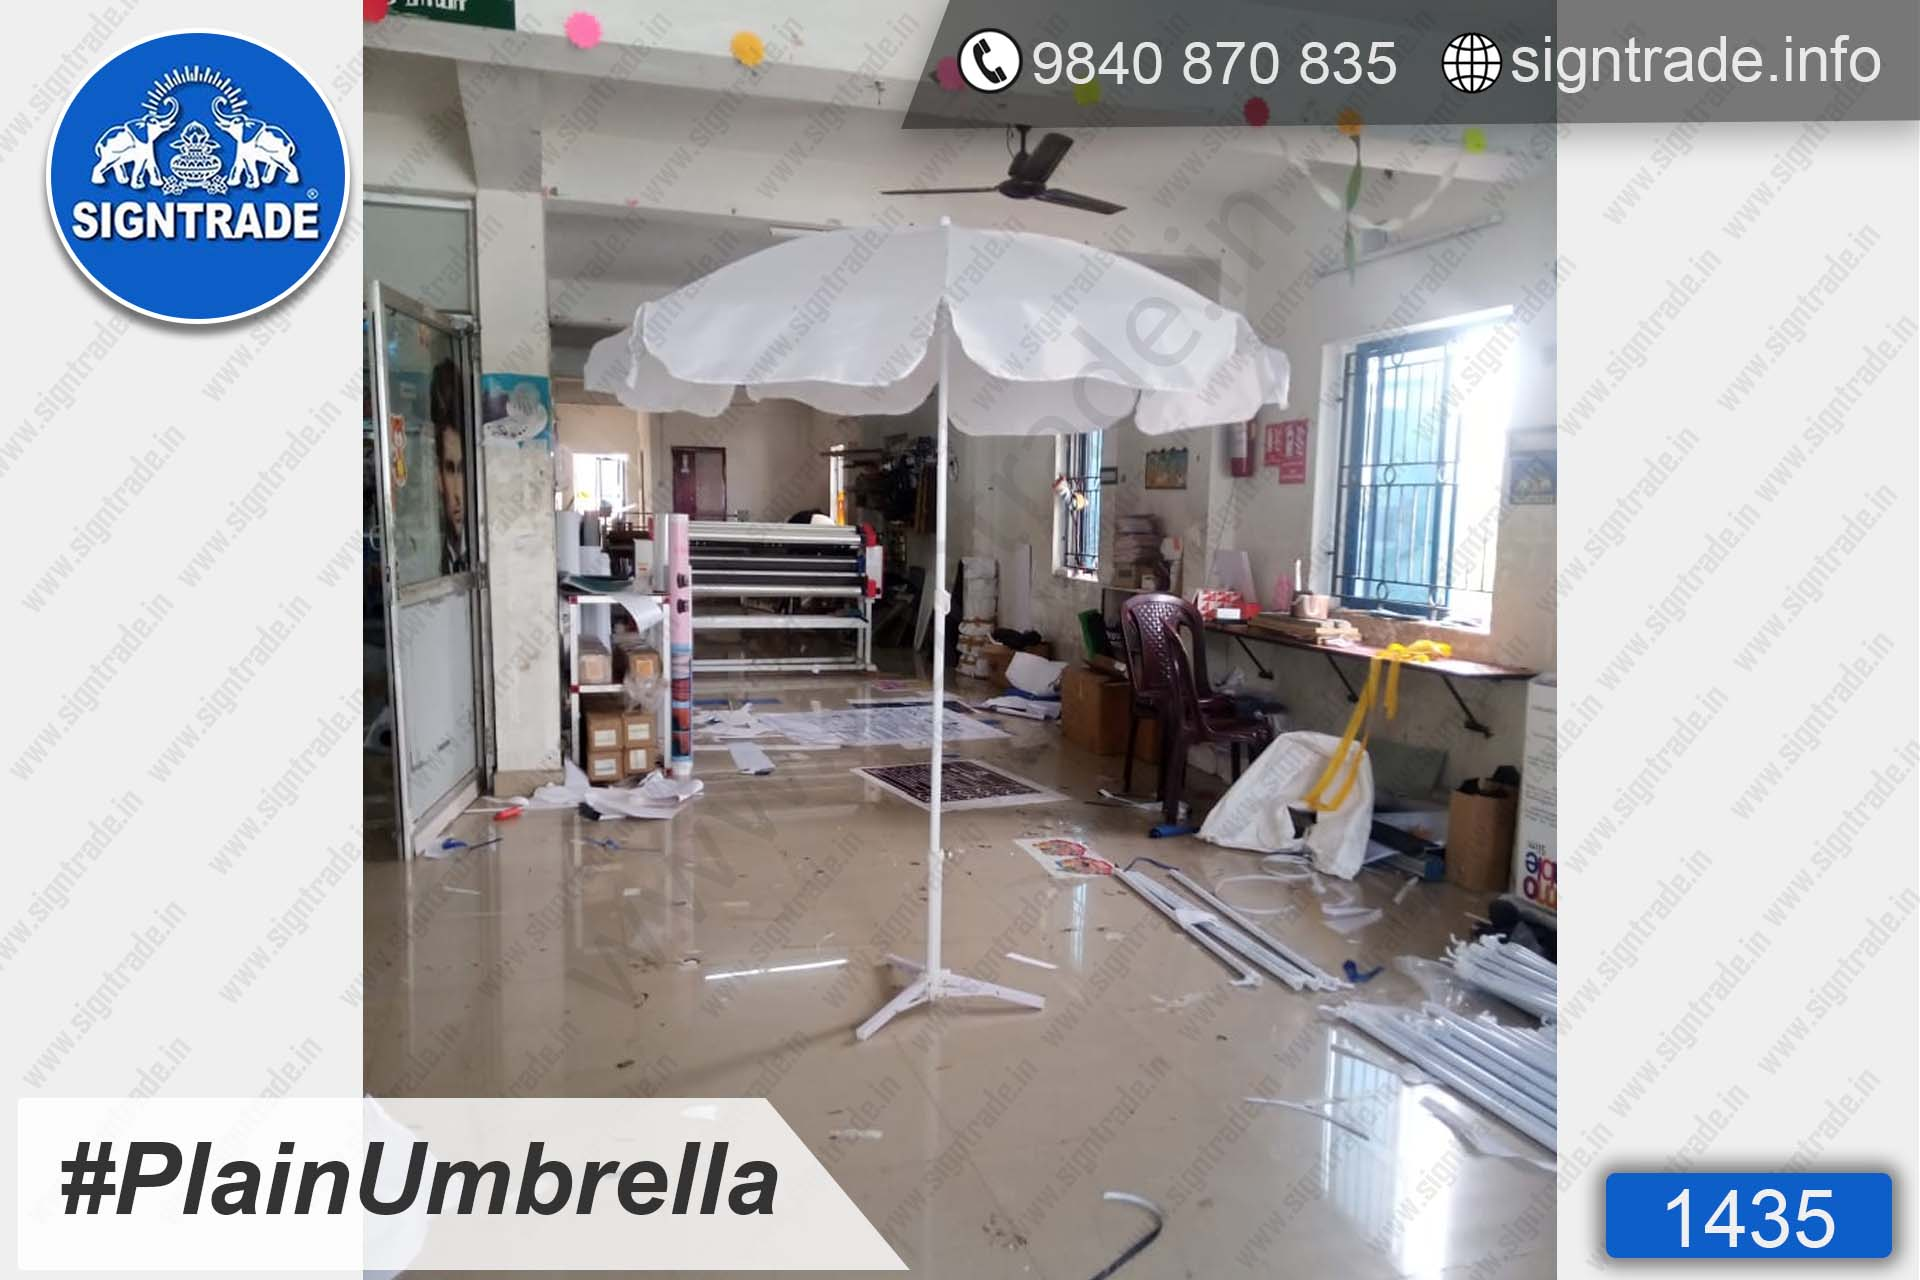 1435, Promotional Umbrella, Umbrella, Promo Umbrella, Advertising Umbrella, Big Umbrella, Large Umbrella, Printed Umbrella, Plain Umbrella, White Umbrella